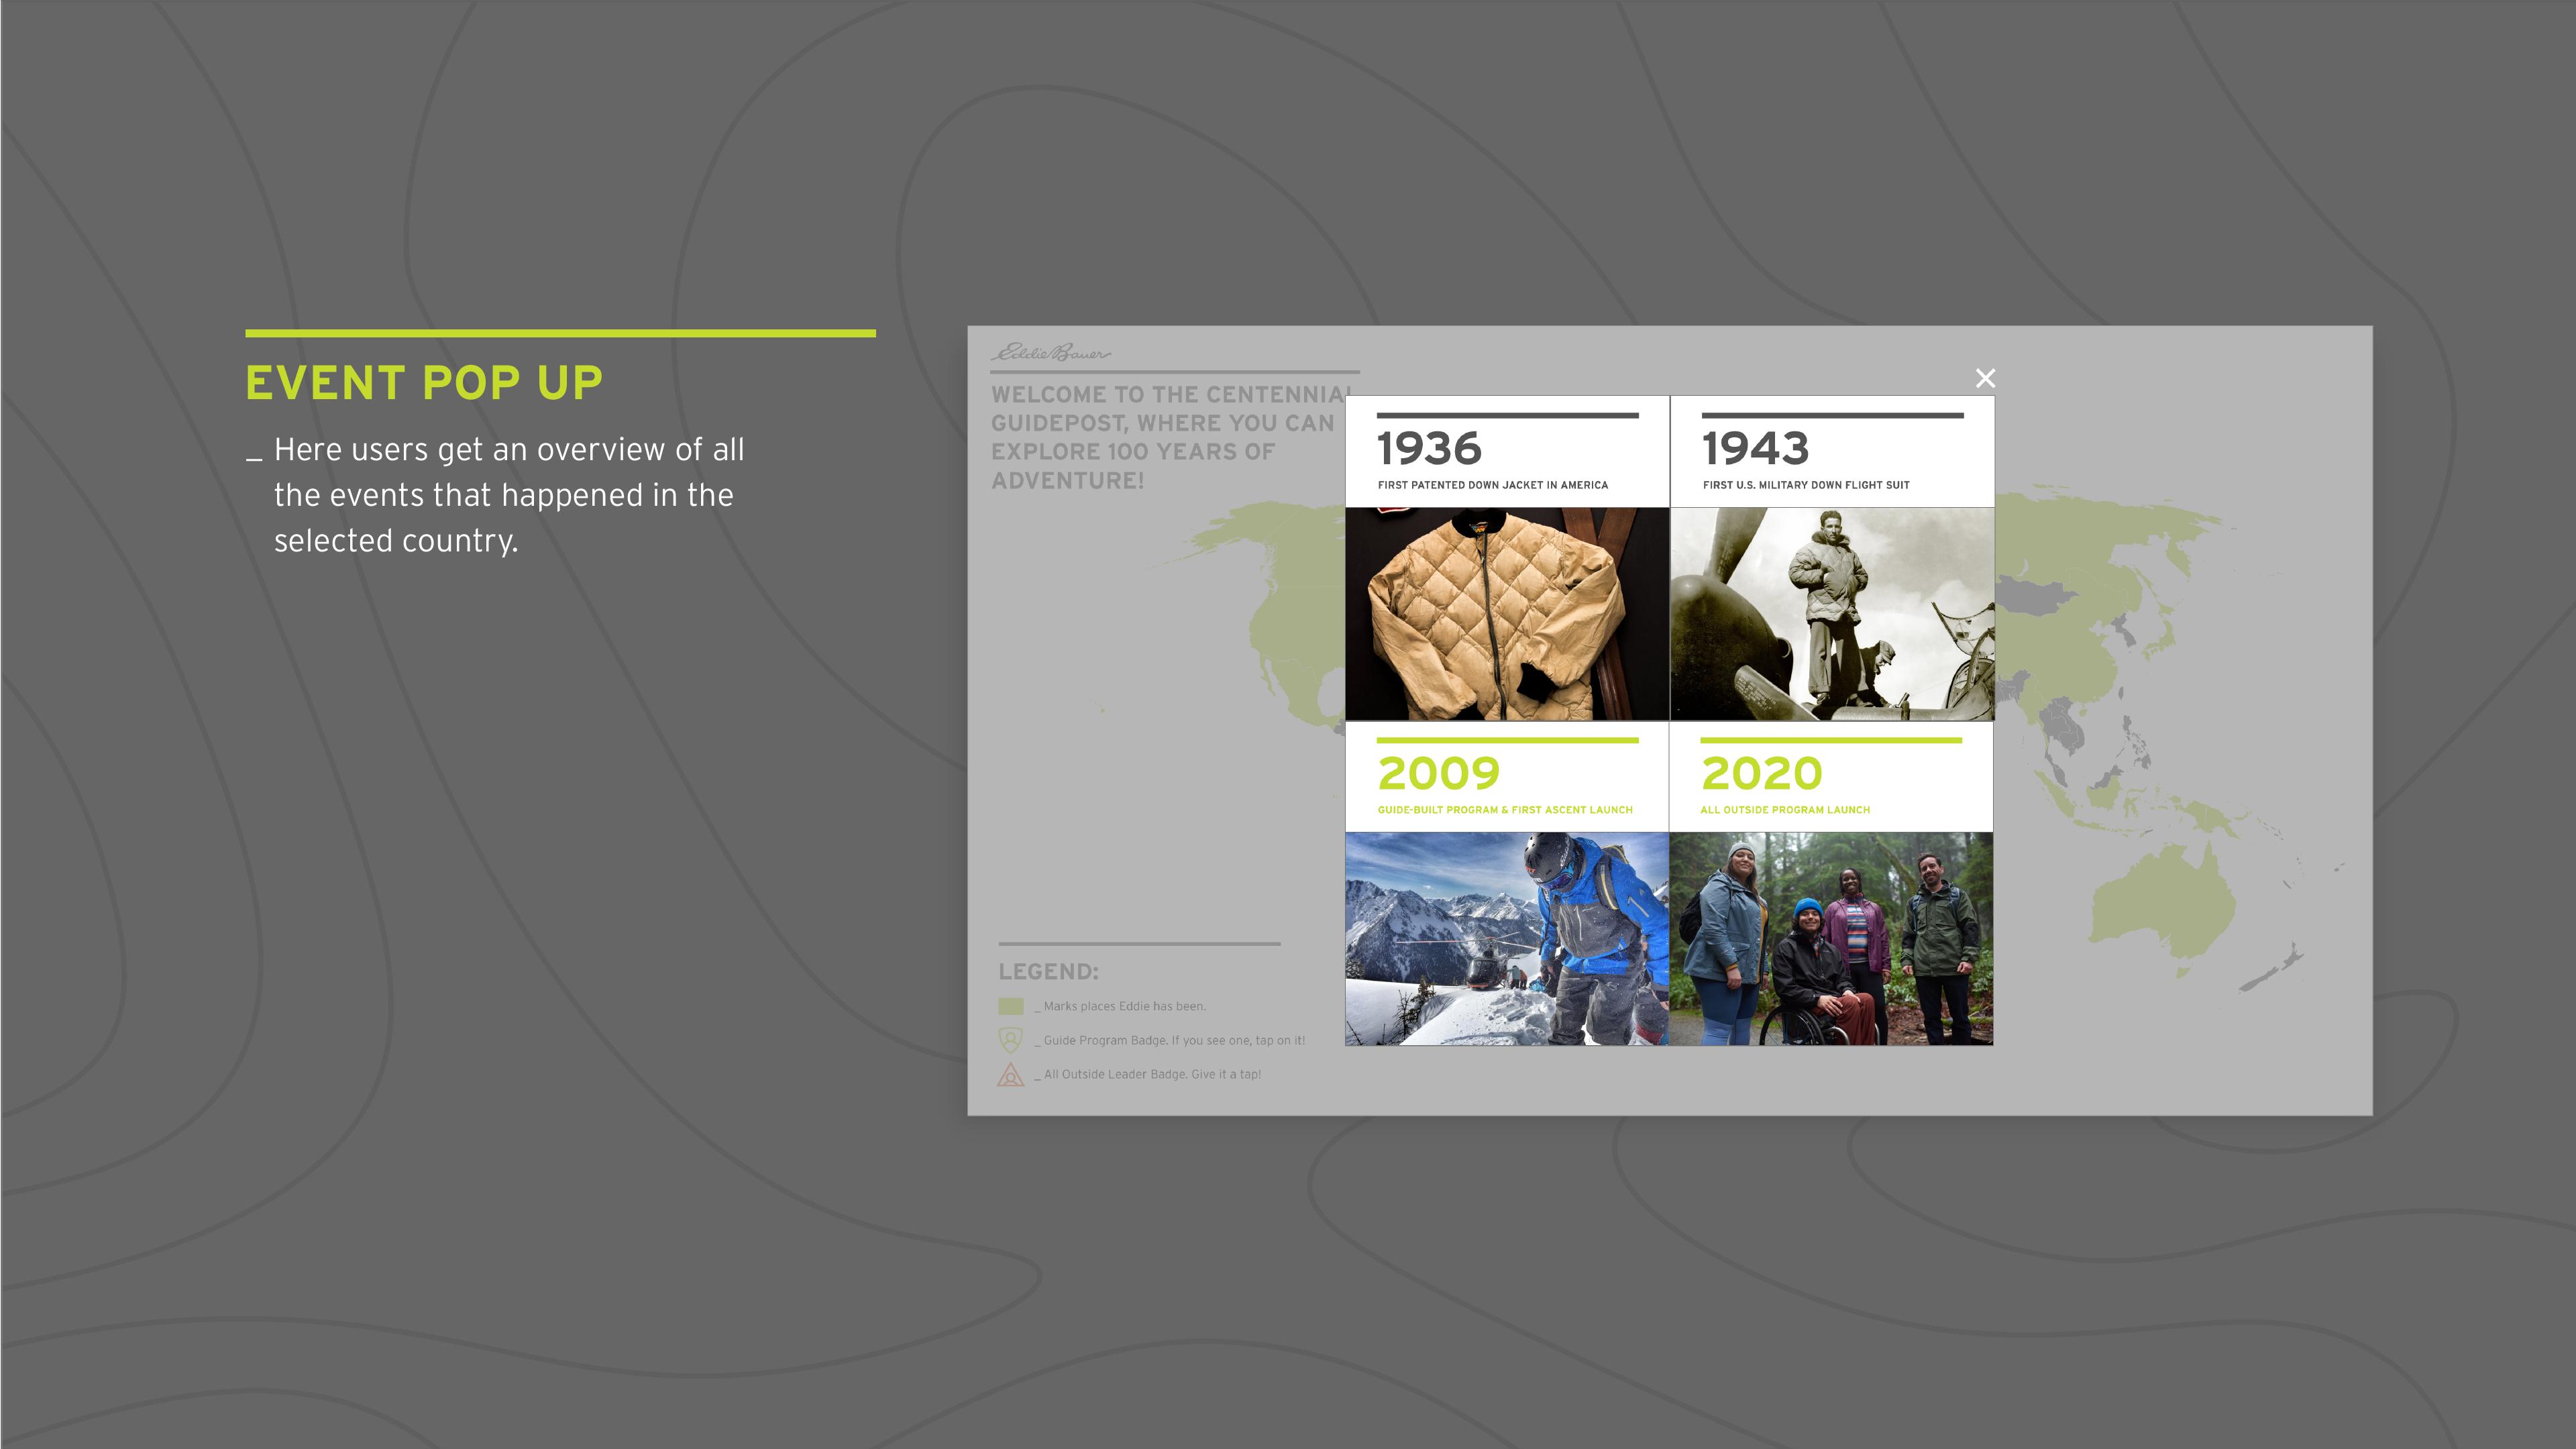 eddie_bauer_basecamp_screens_2.0Artboard-2-copy-11@2x